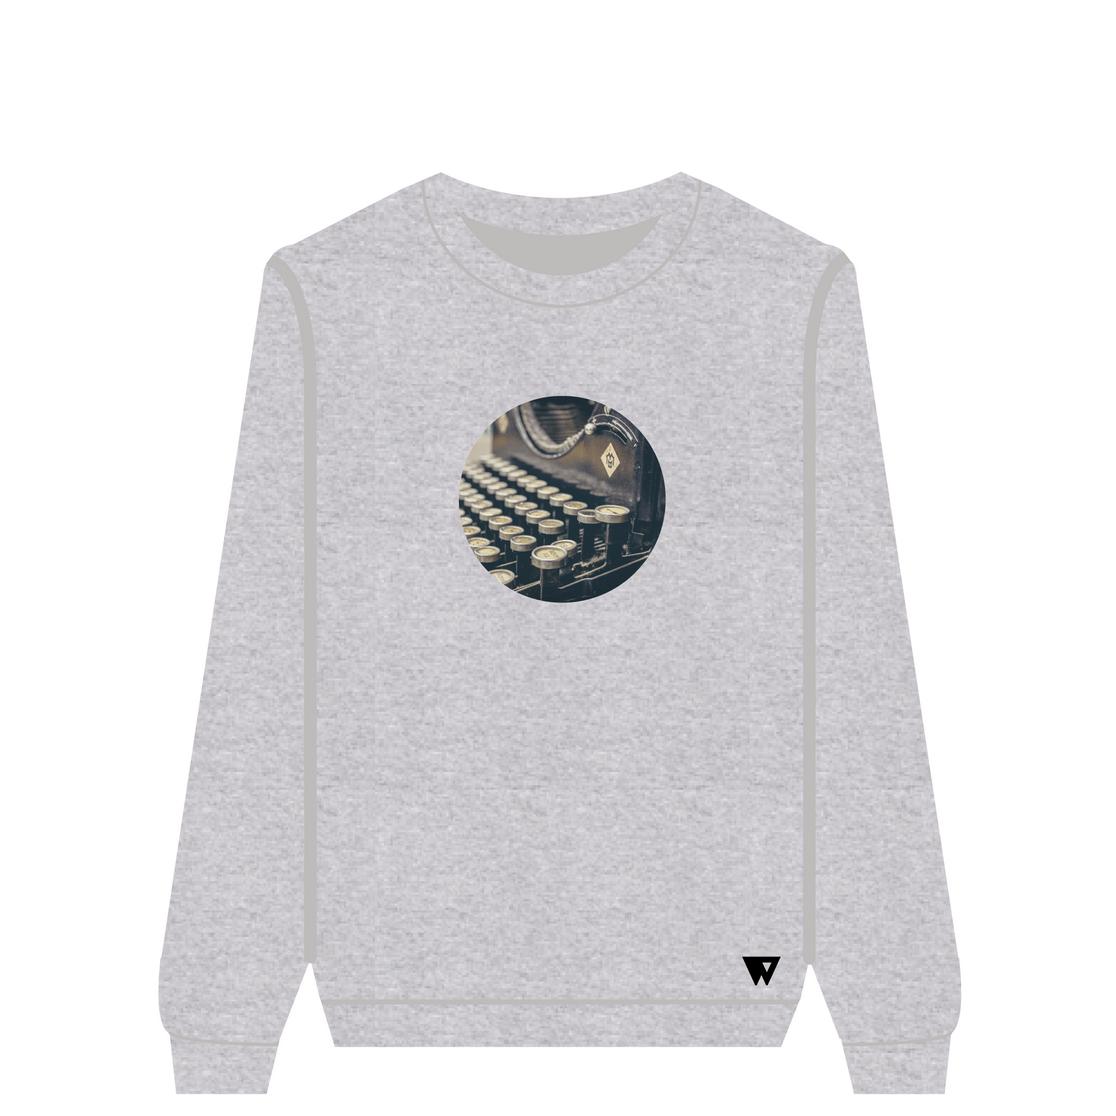 Sweatshirt Typeprint   Wuzzee